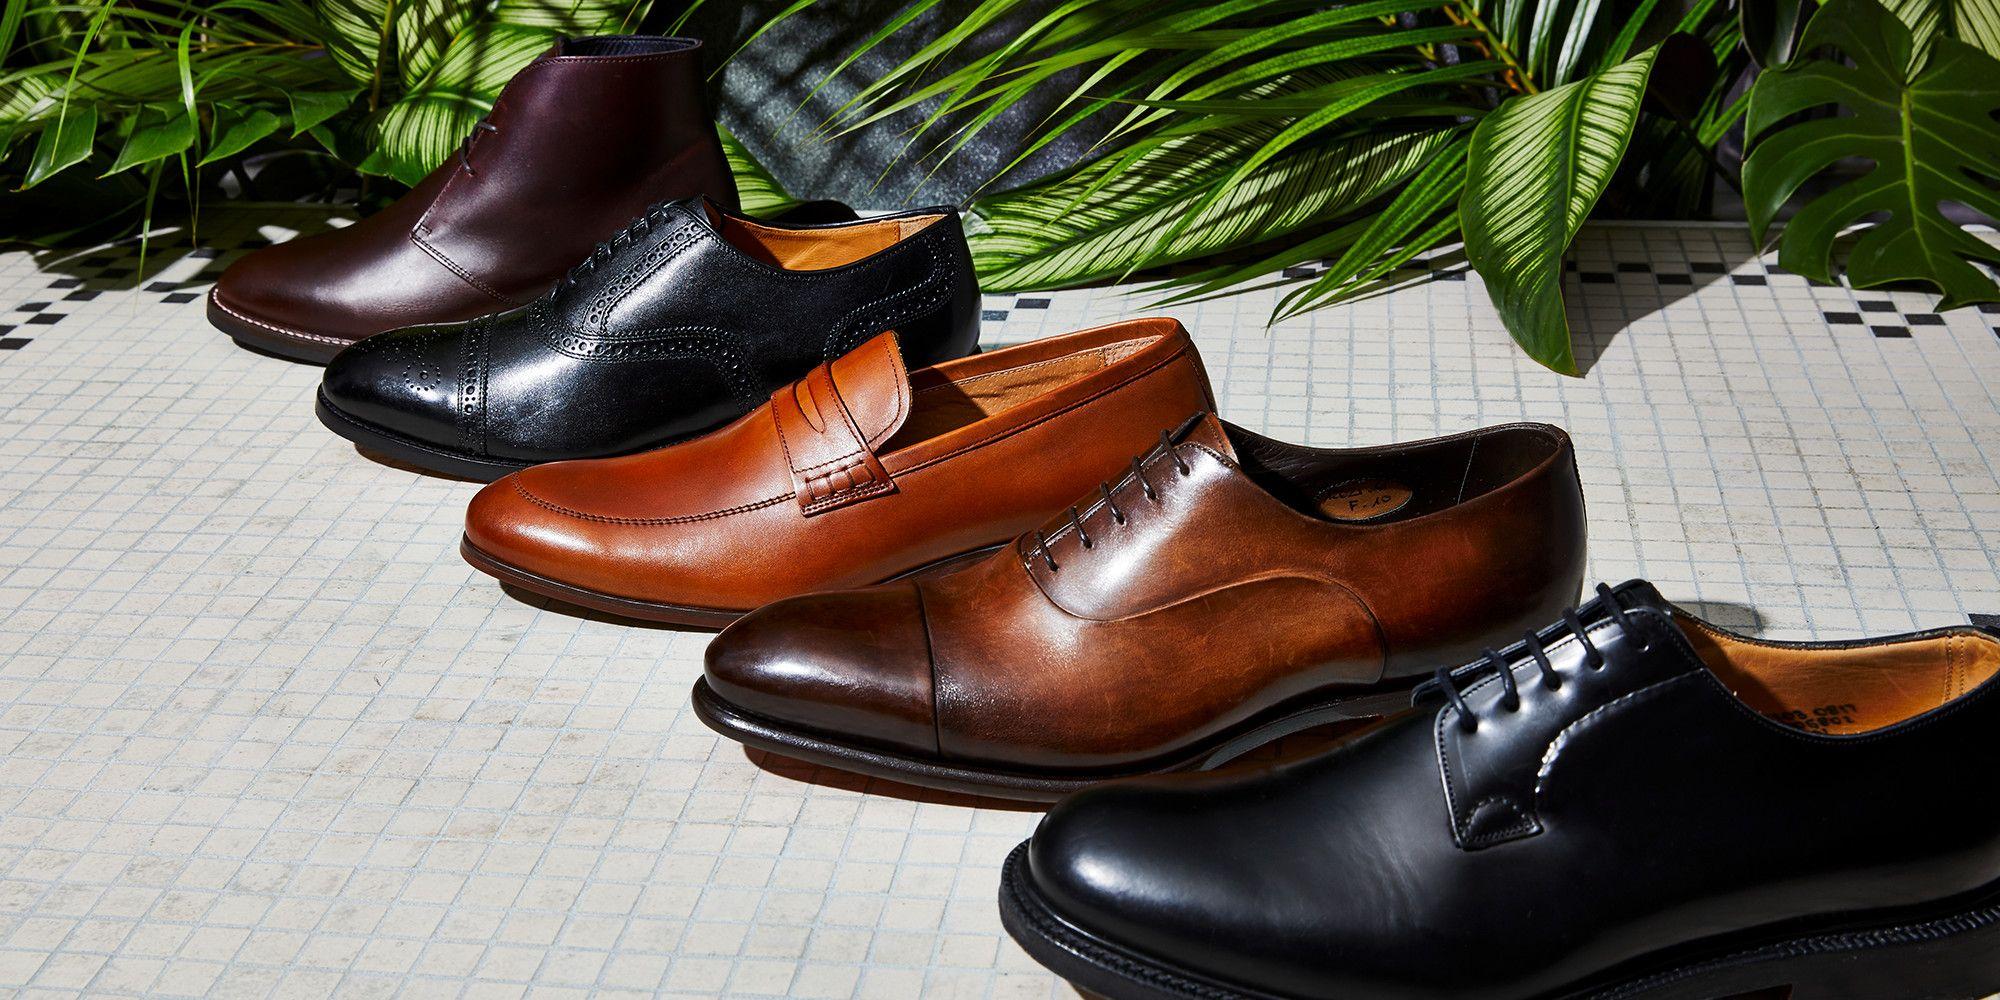 5 Best Dress Shoes for Men 2020 - Men's